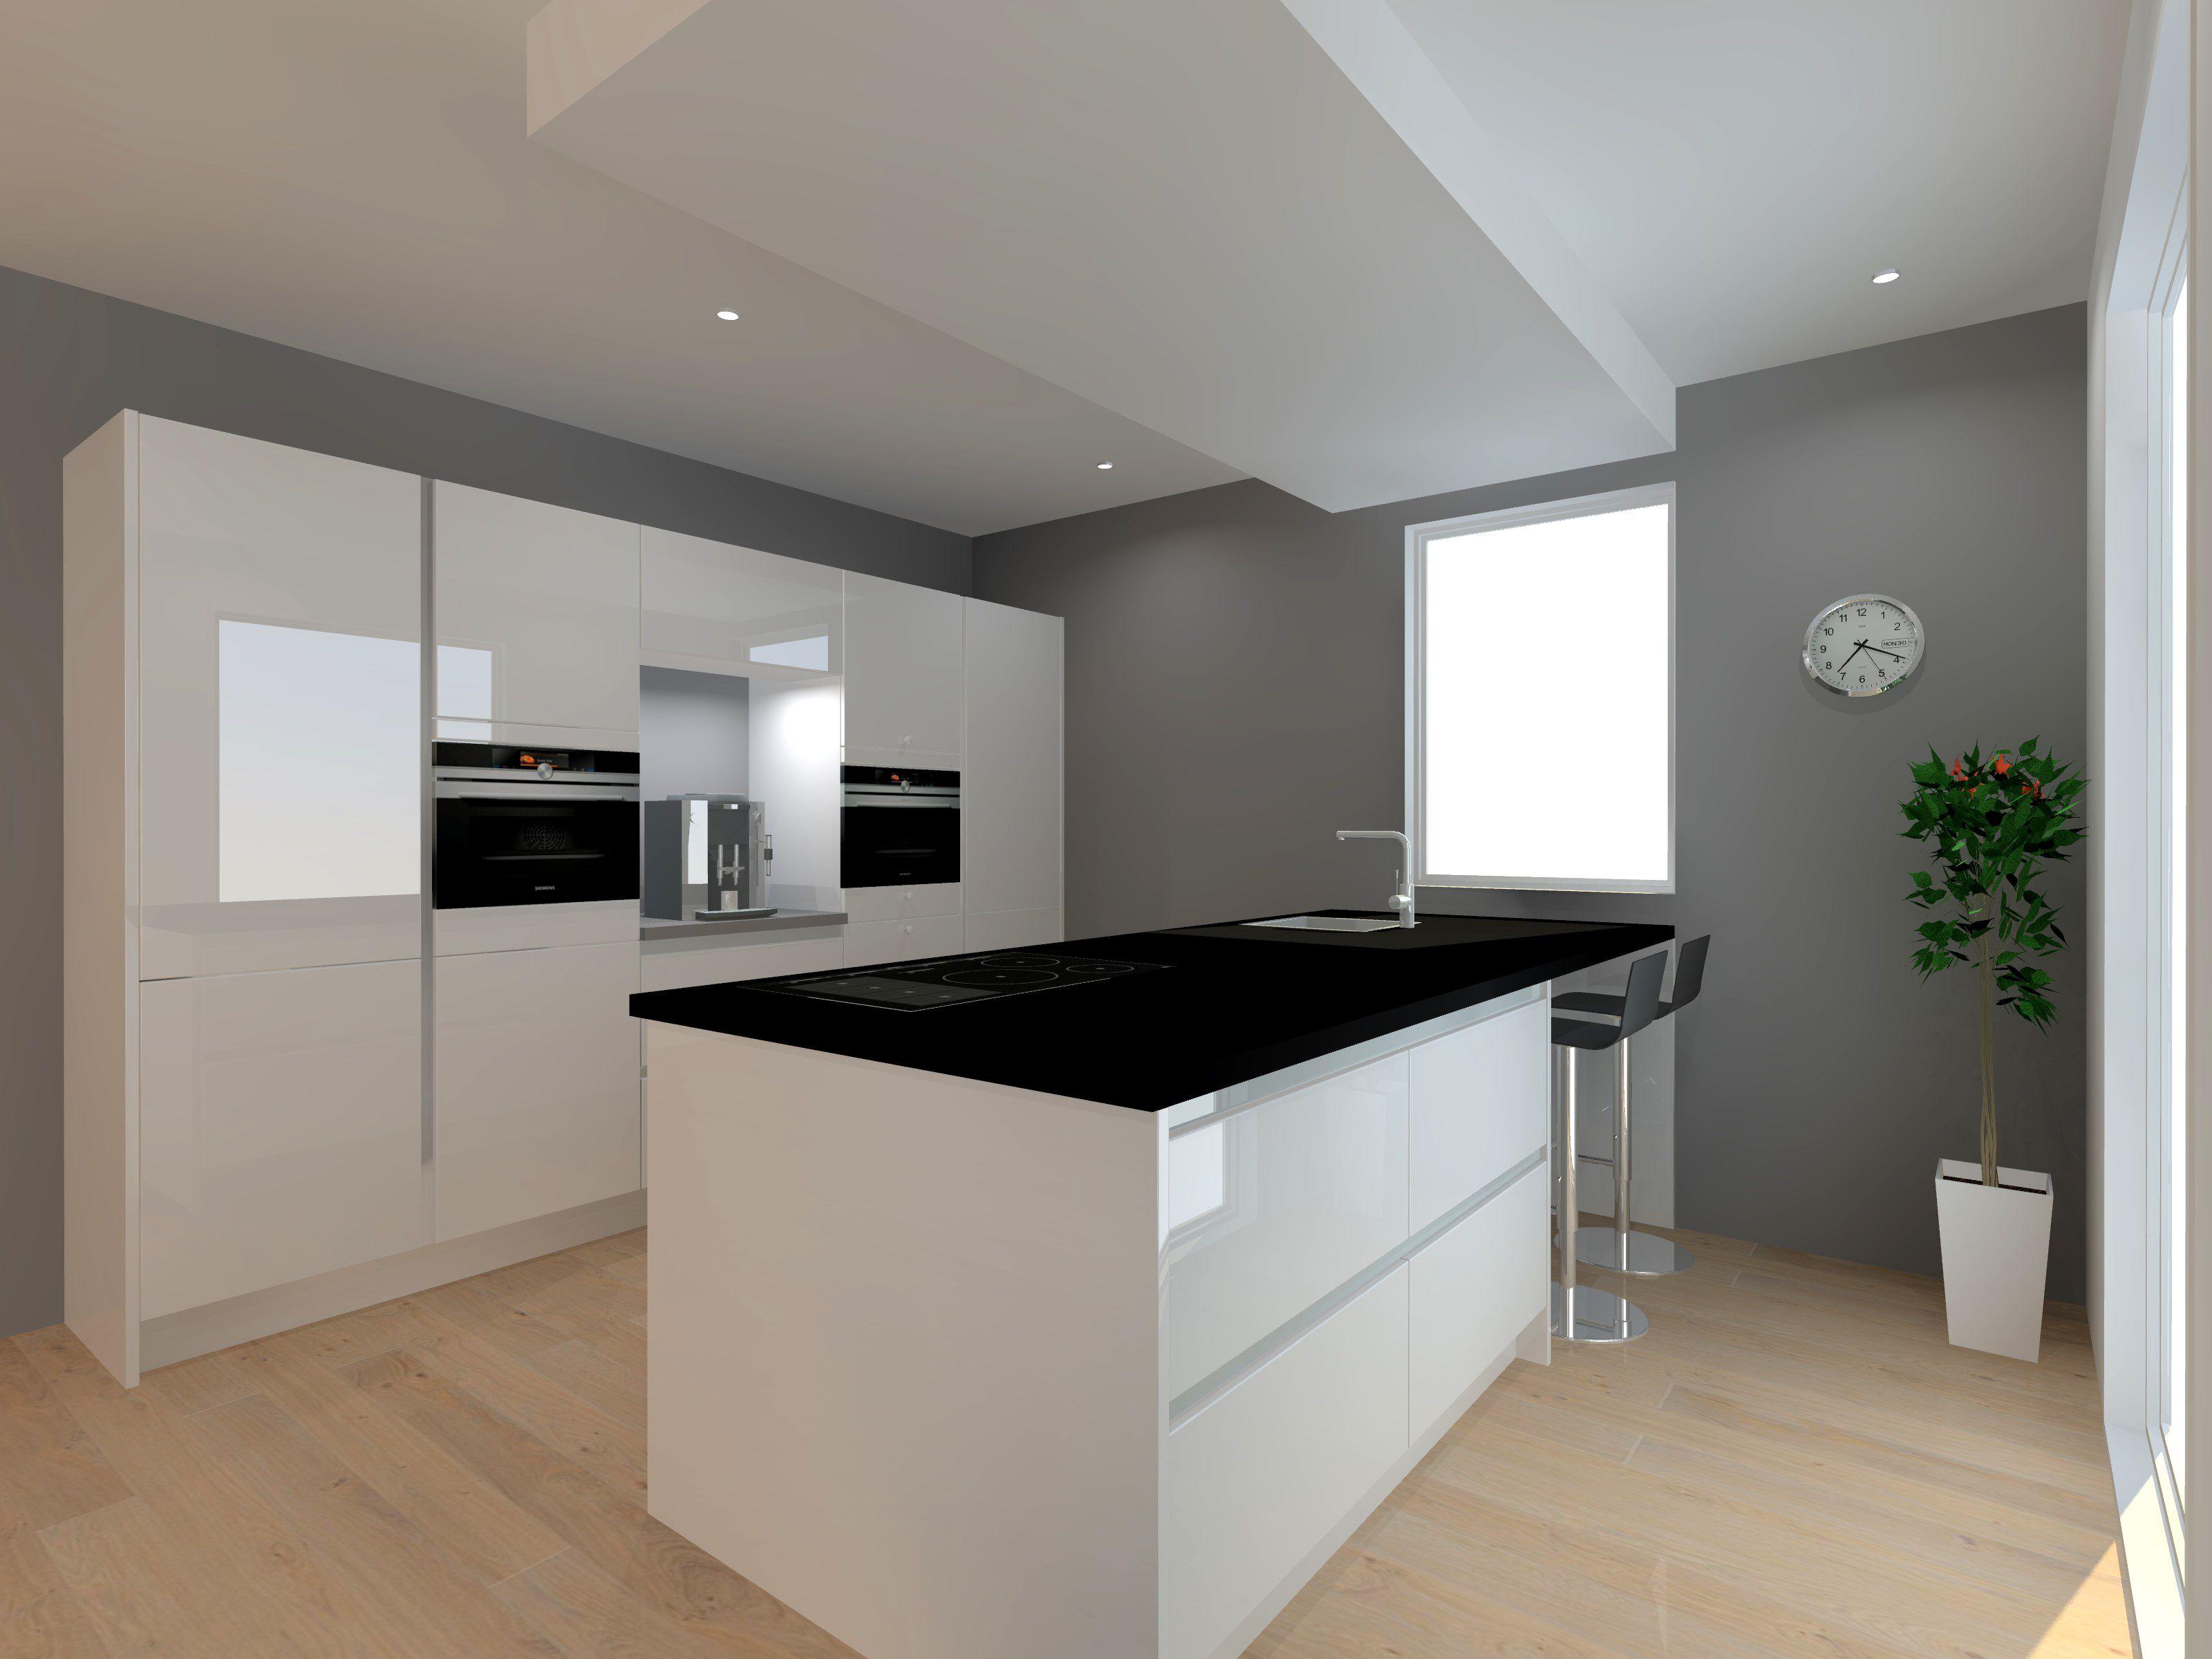 Virtual Reality Keuken : D keukenontwerp virtuele keuken plaatsing virtual reality keuken